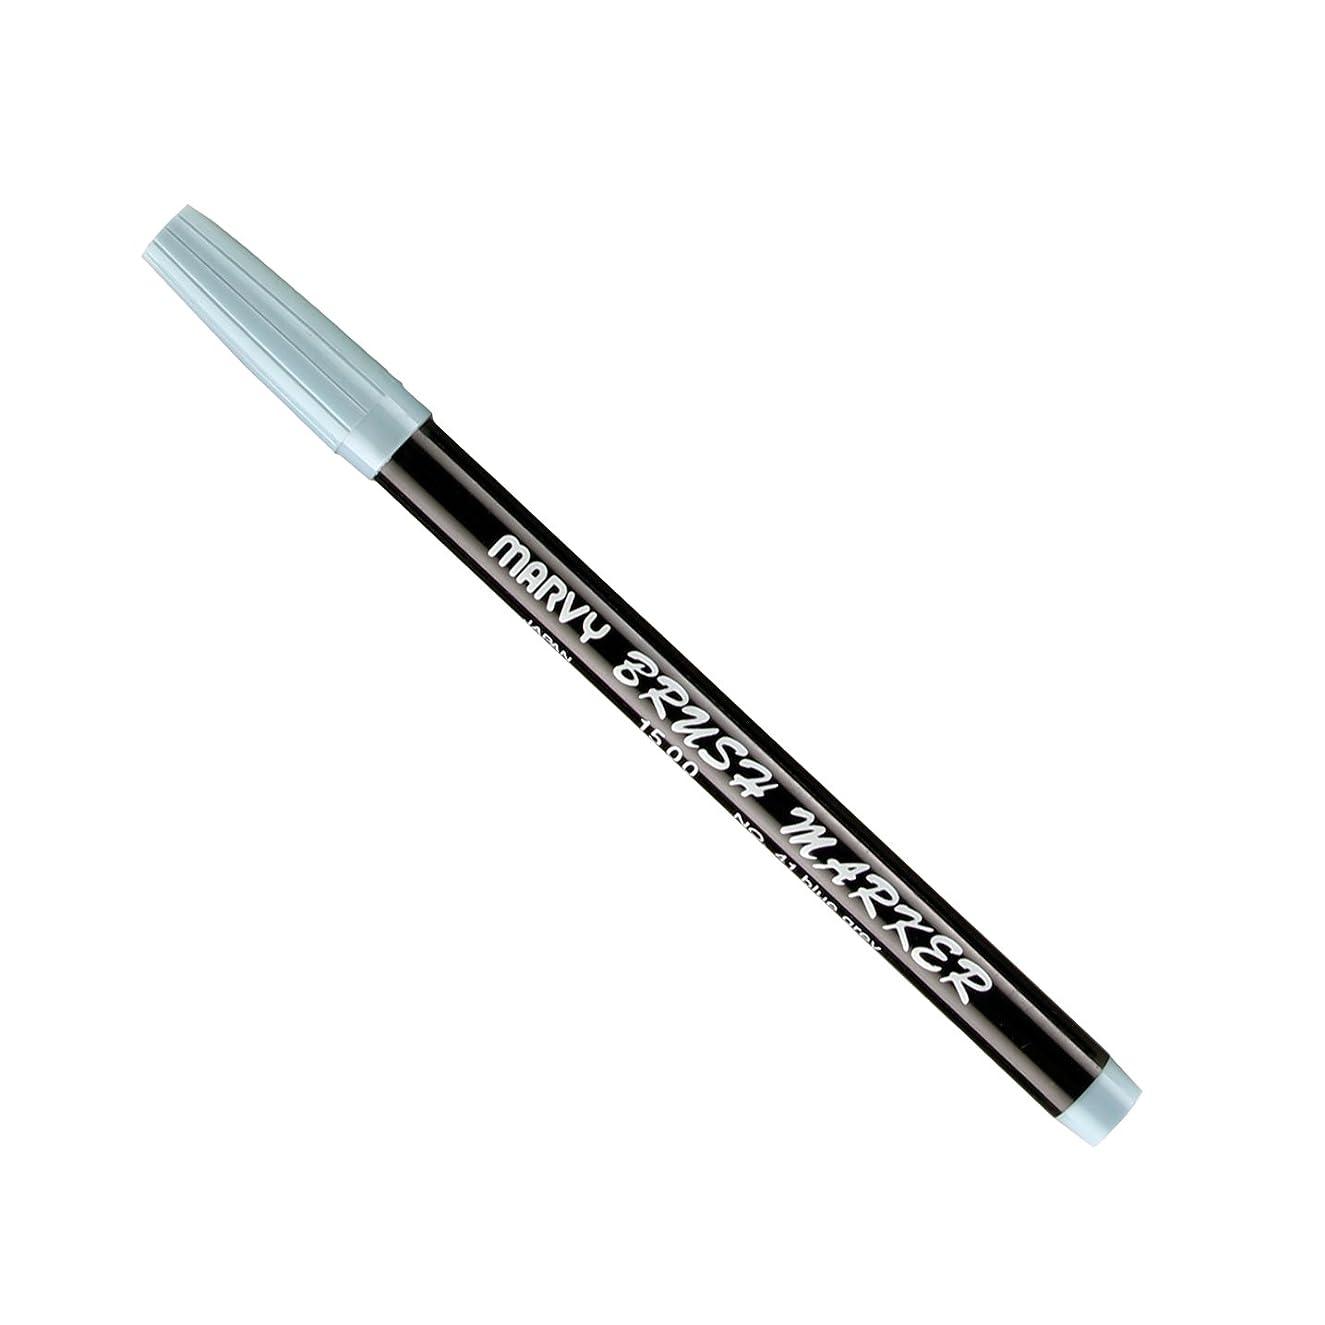 Uchida Of America 1500-C-41 Brush Marker, Blue Grey